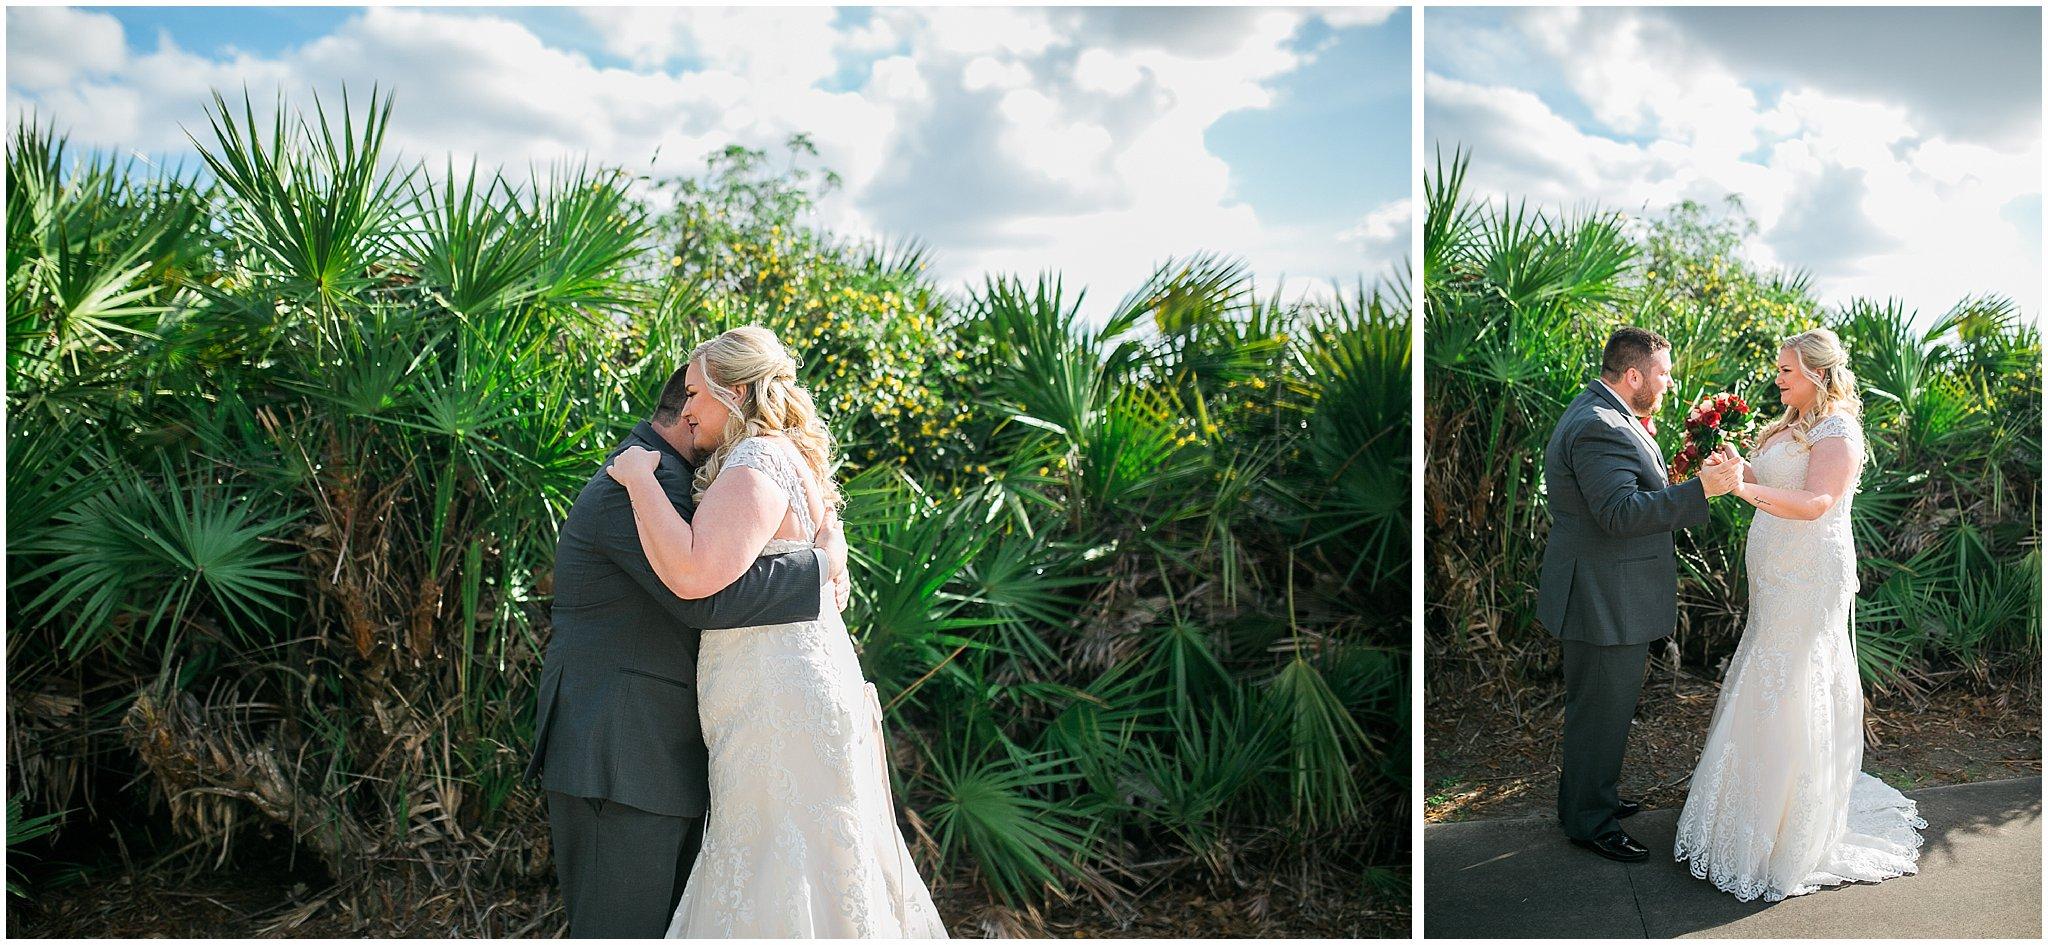 Eagle Creek Golf Club Wedding Orlando Florida Wedding Sweet Alice Photography 14.jpg